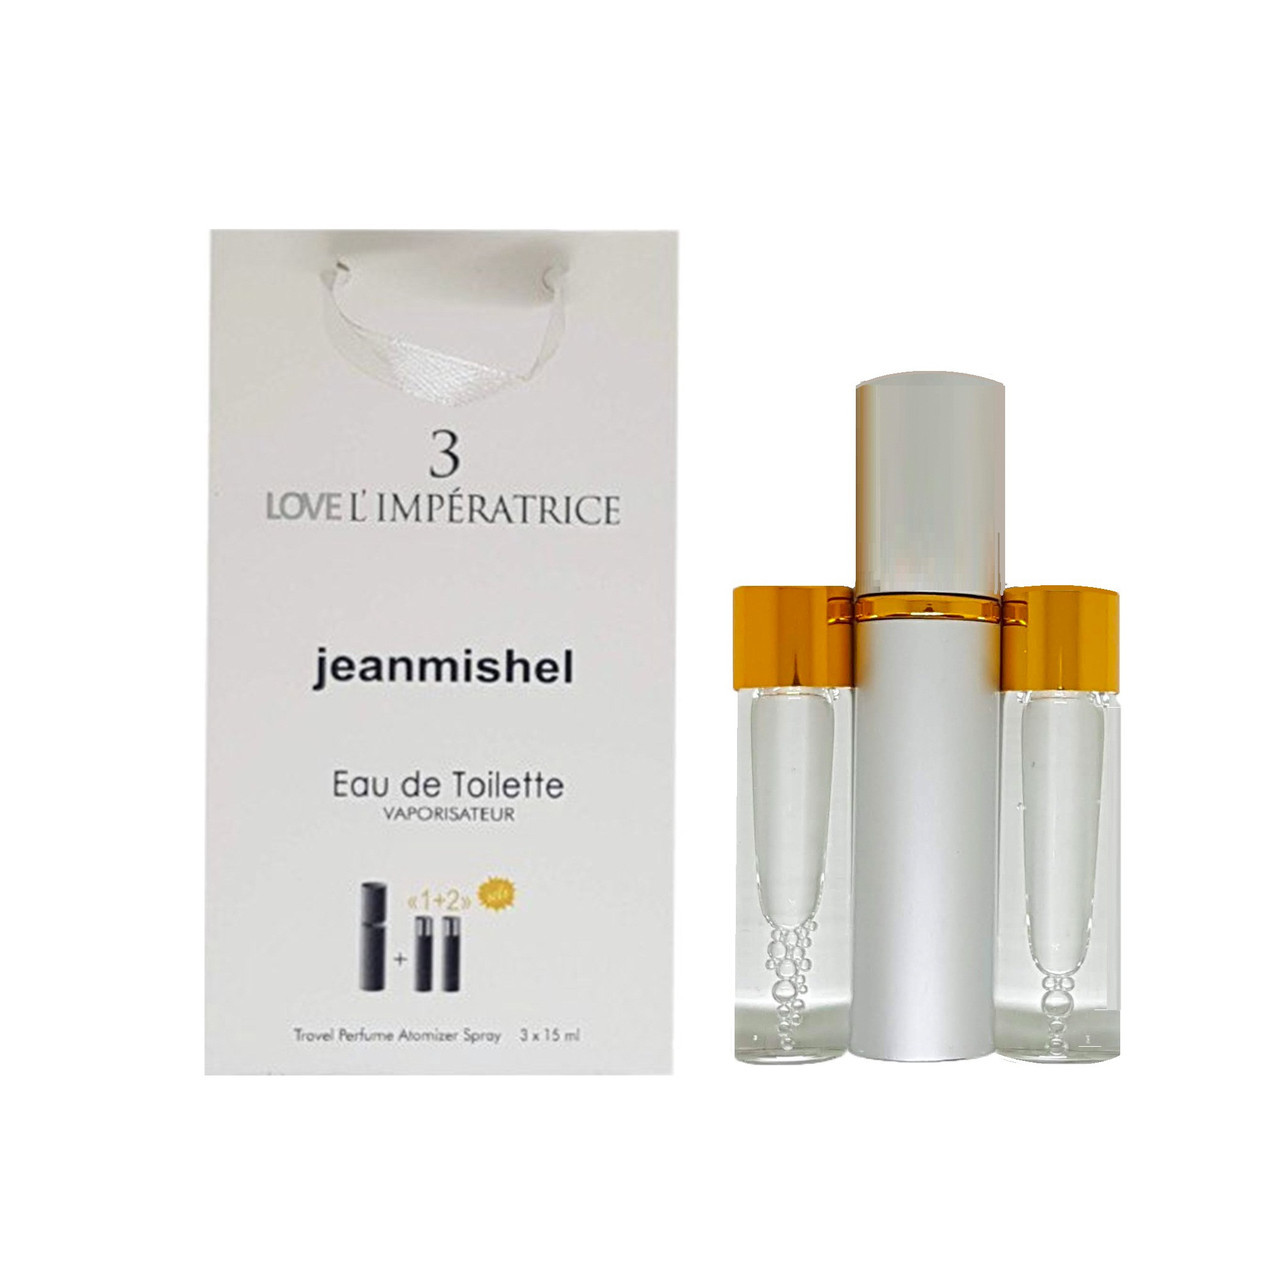 Jeanmishel Love L`Imperatrice 3 (25) 3 x 15 ml